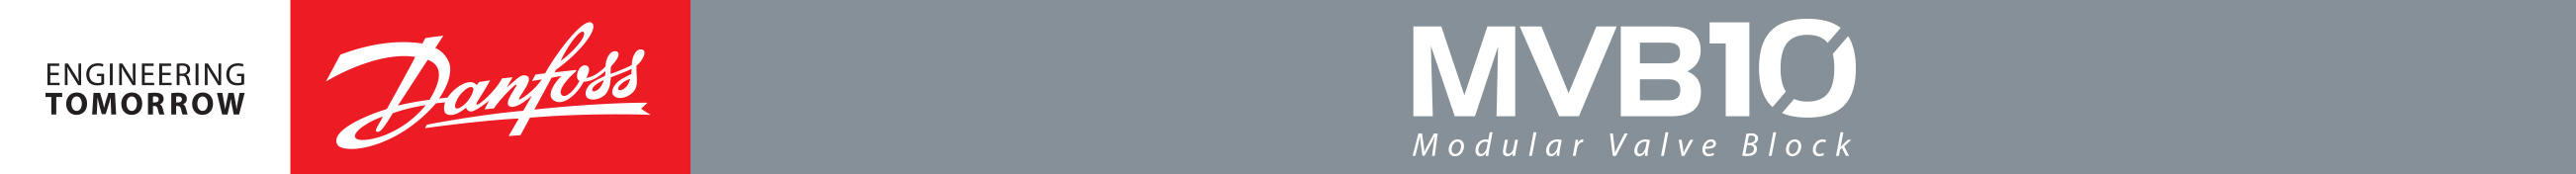 danfoss-mvb10-logo